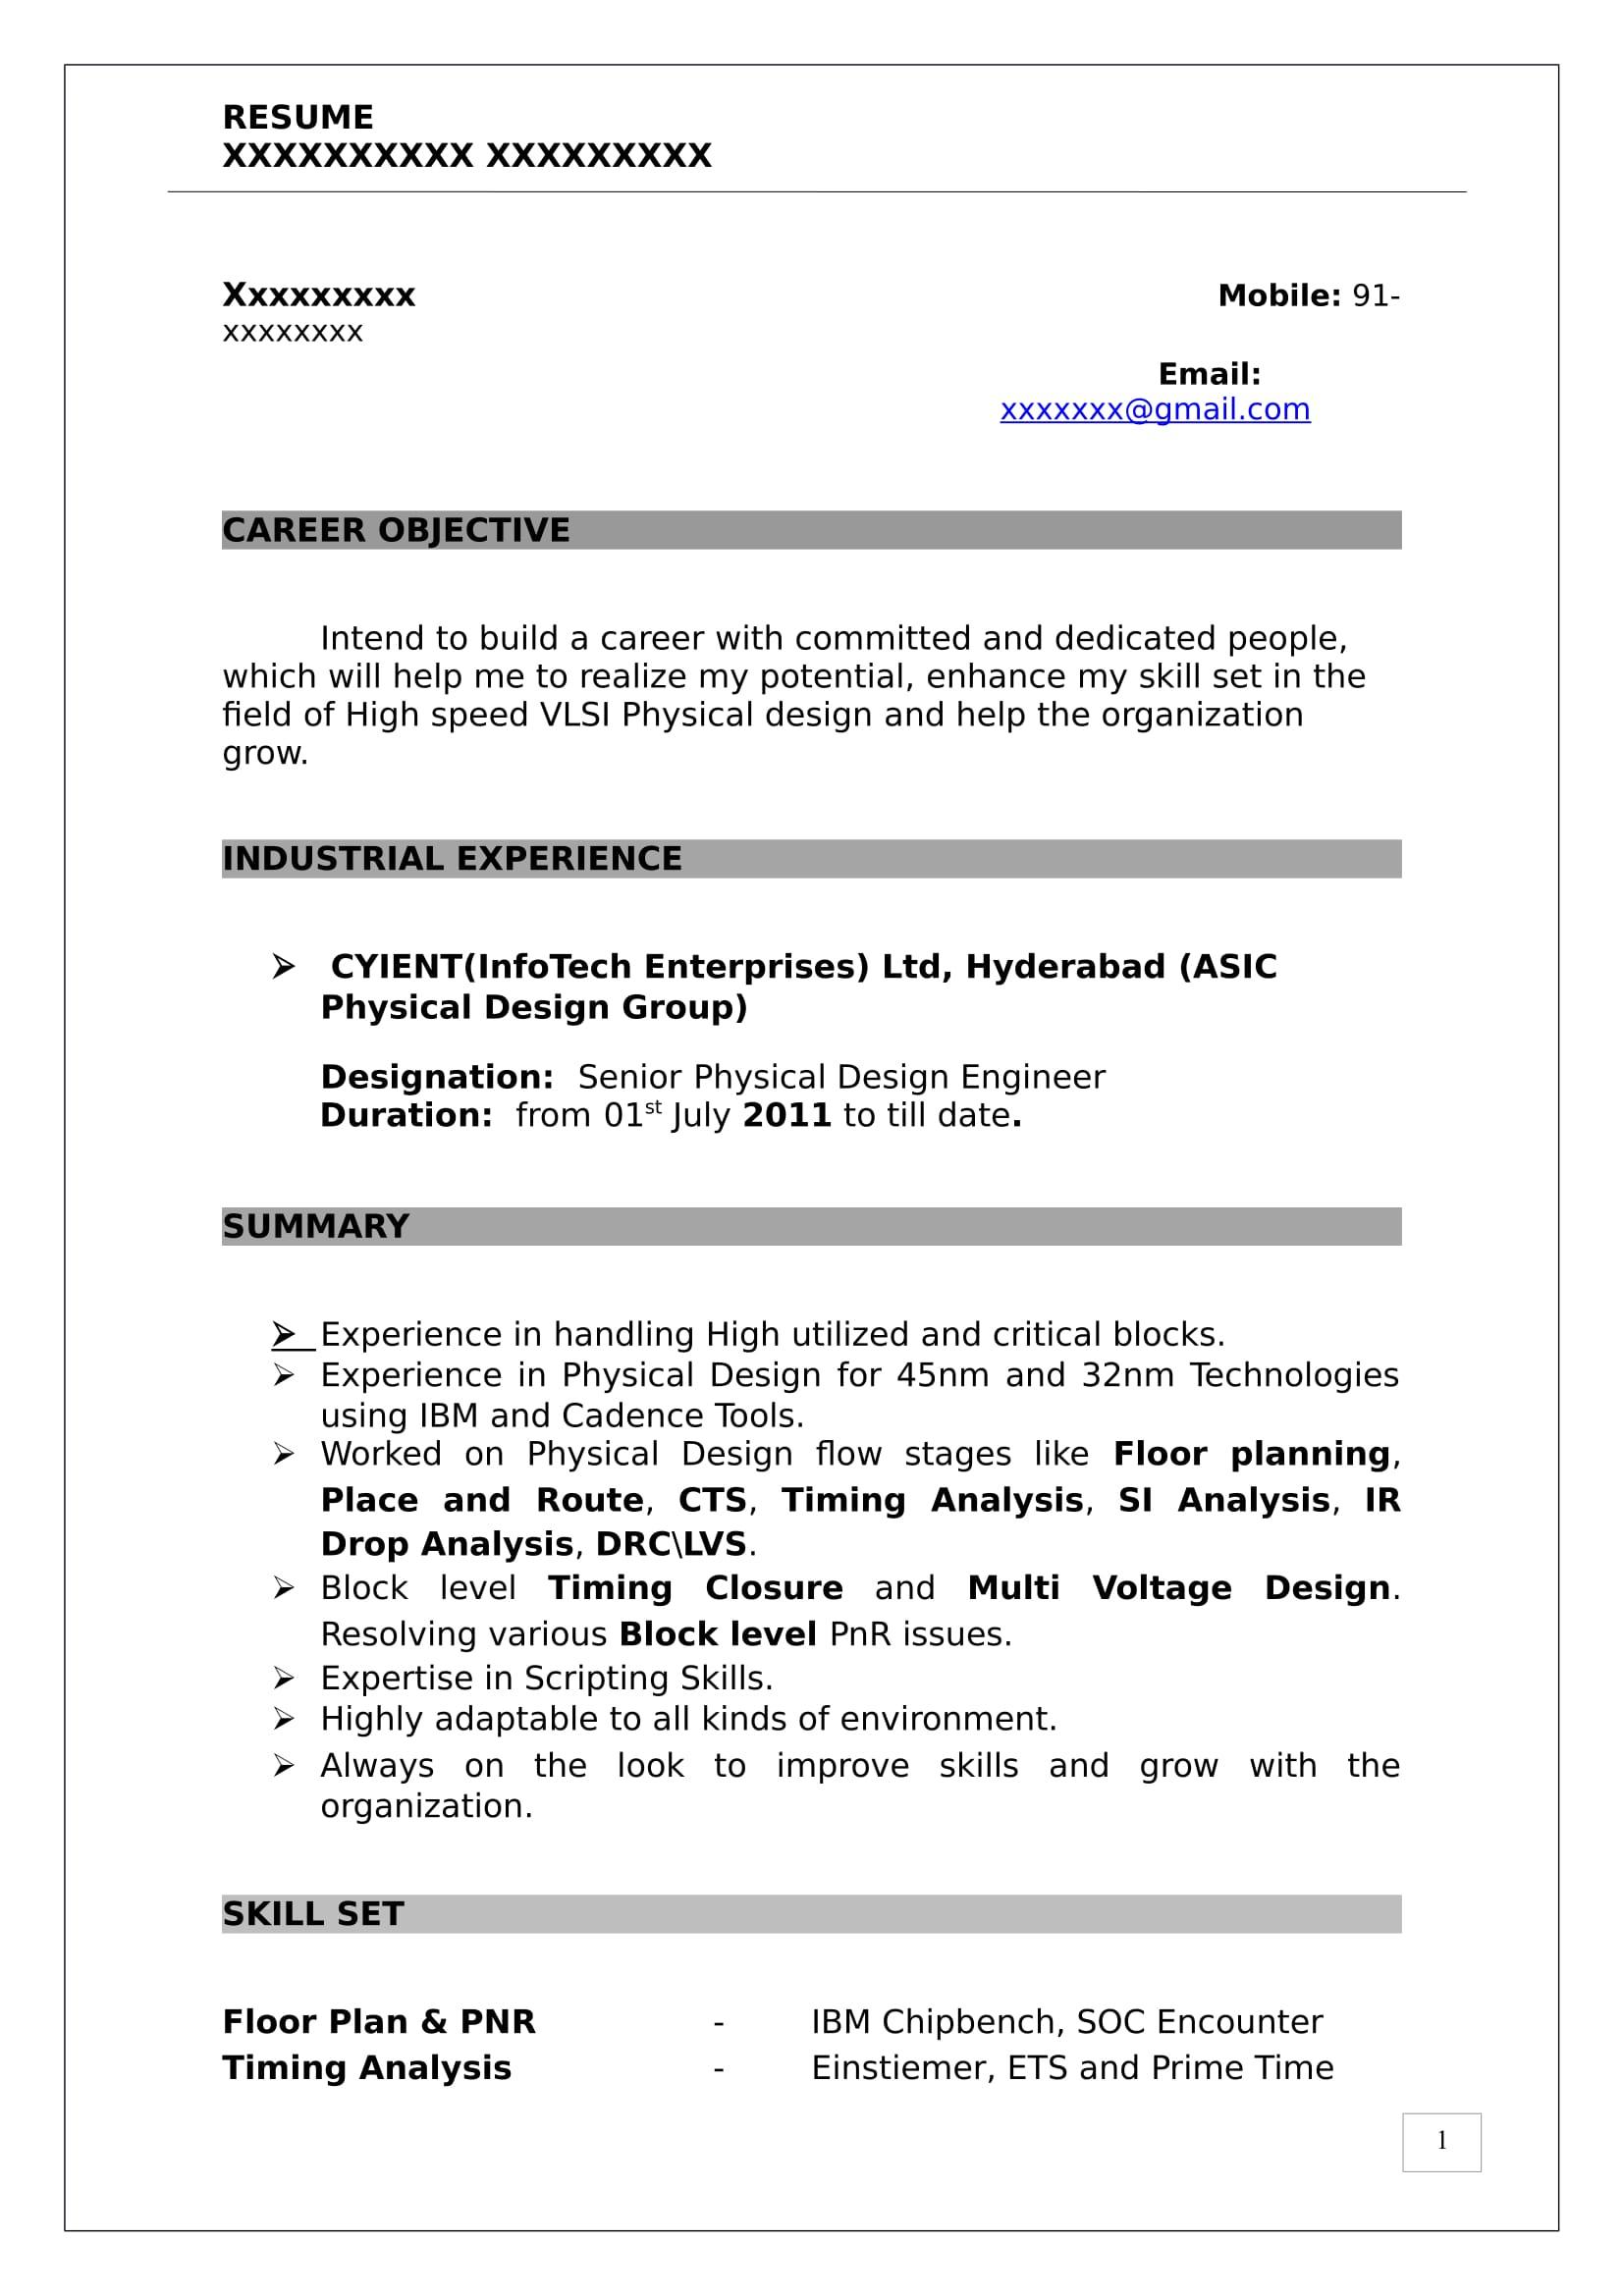 Pd Sample Resume Vlsi